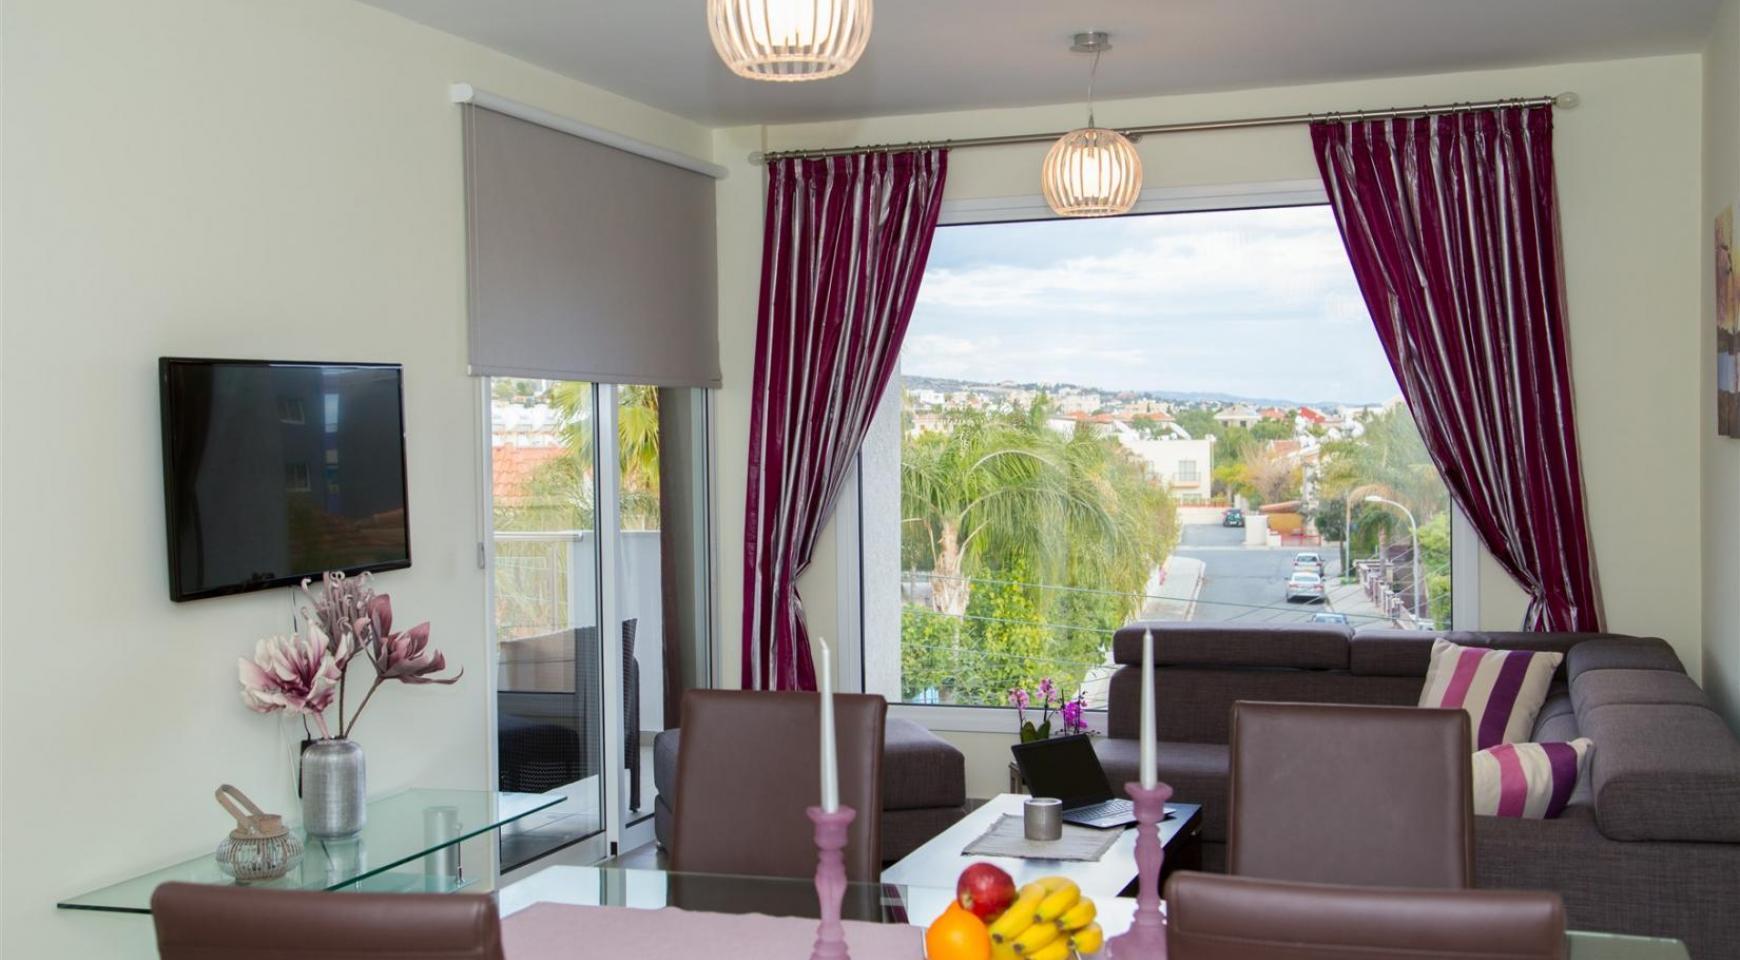 Luxury 2 Bedroom Apartment Christina 301 in the Tourist Area - 1